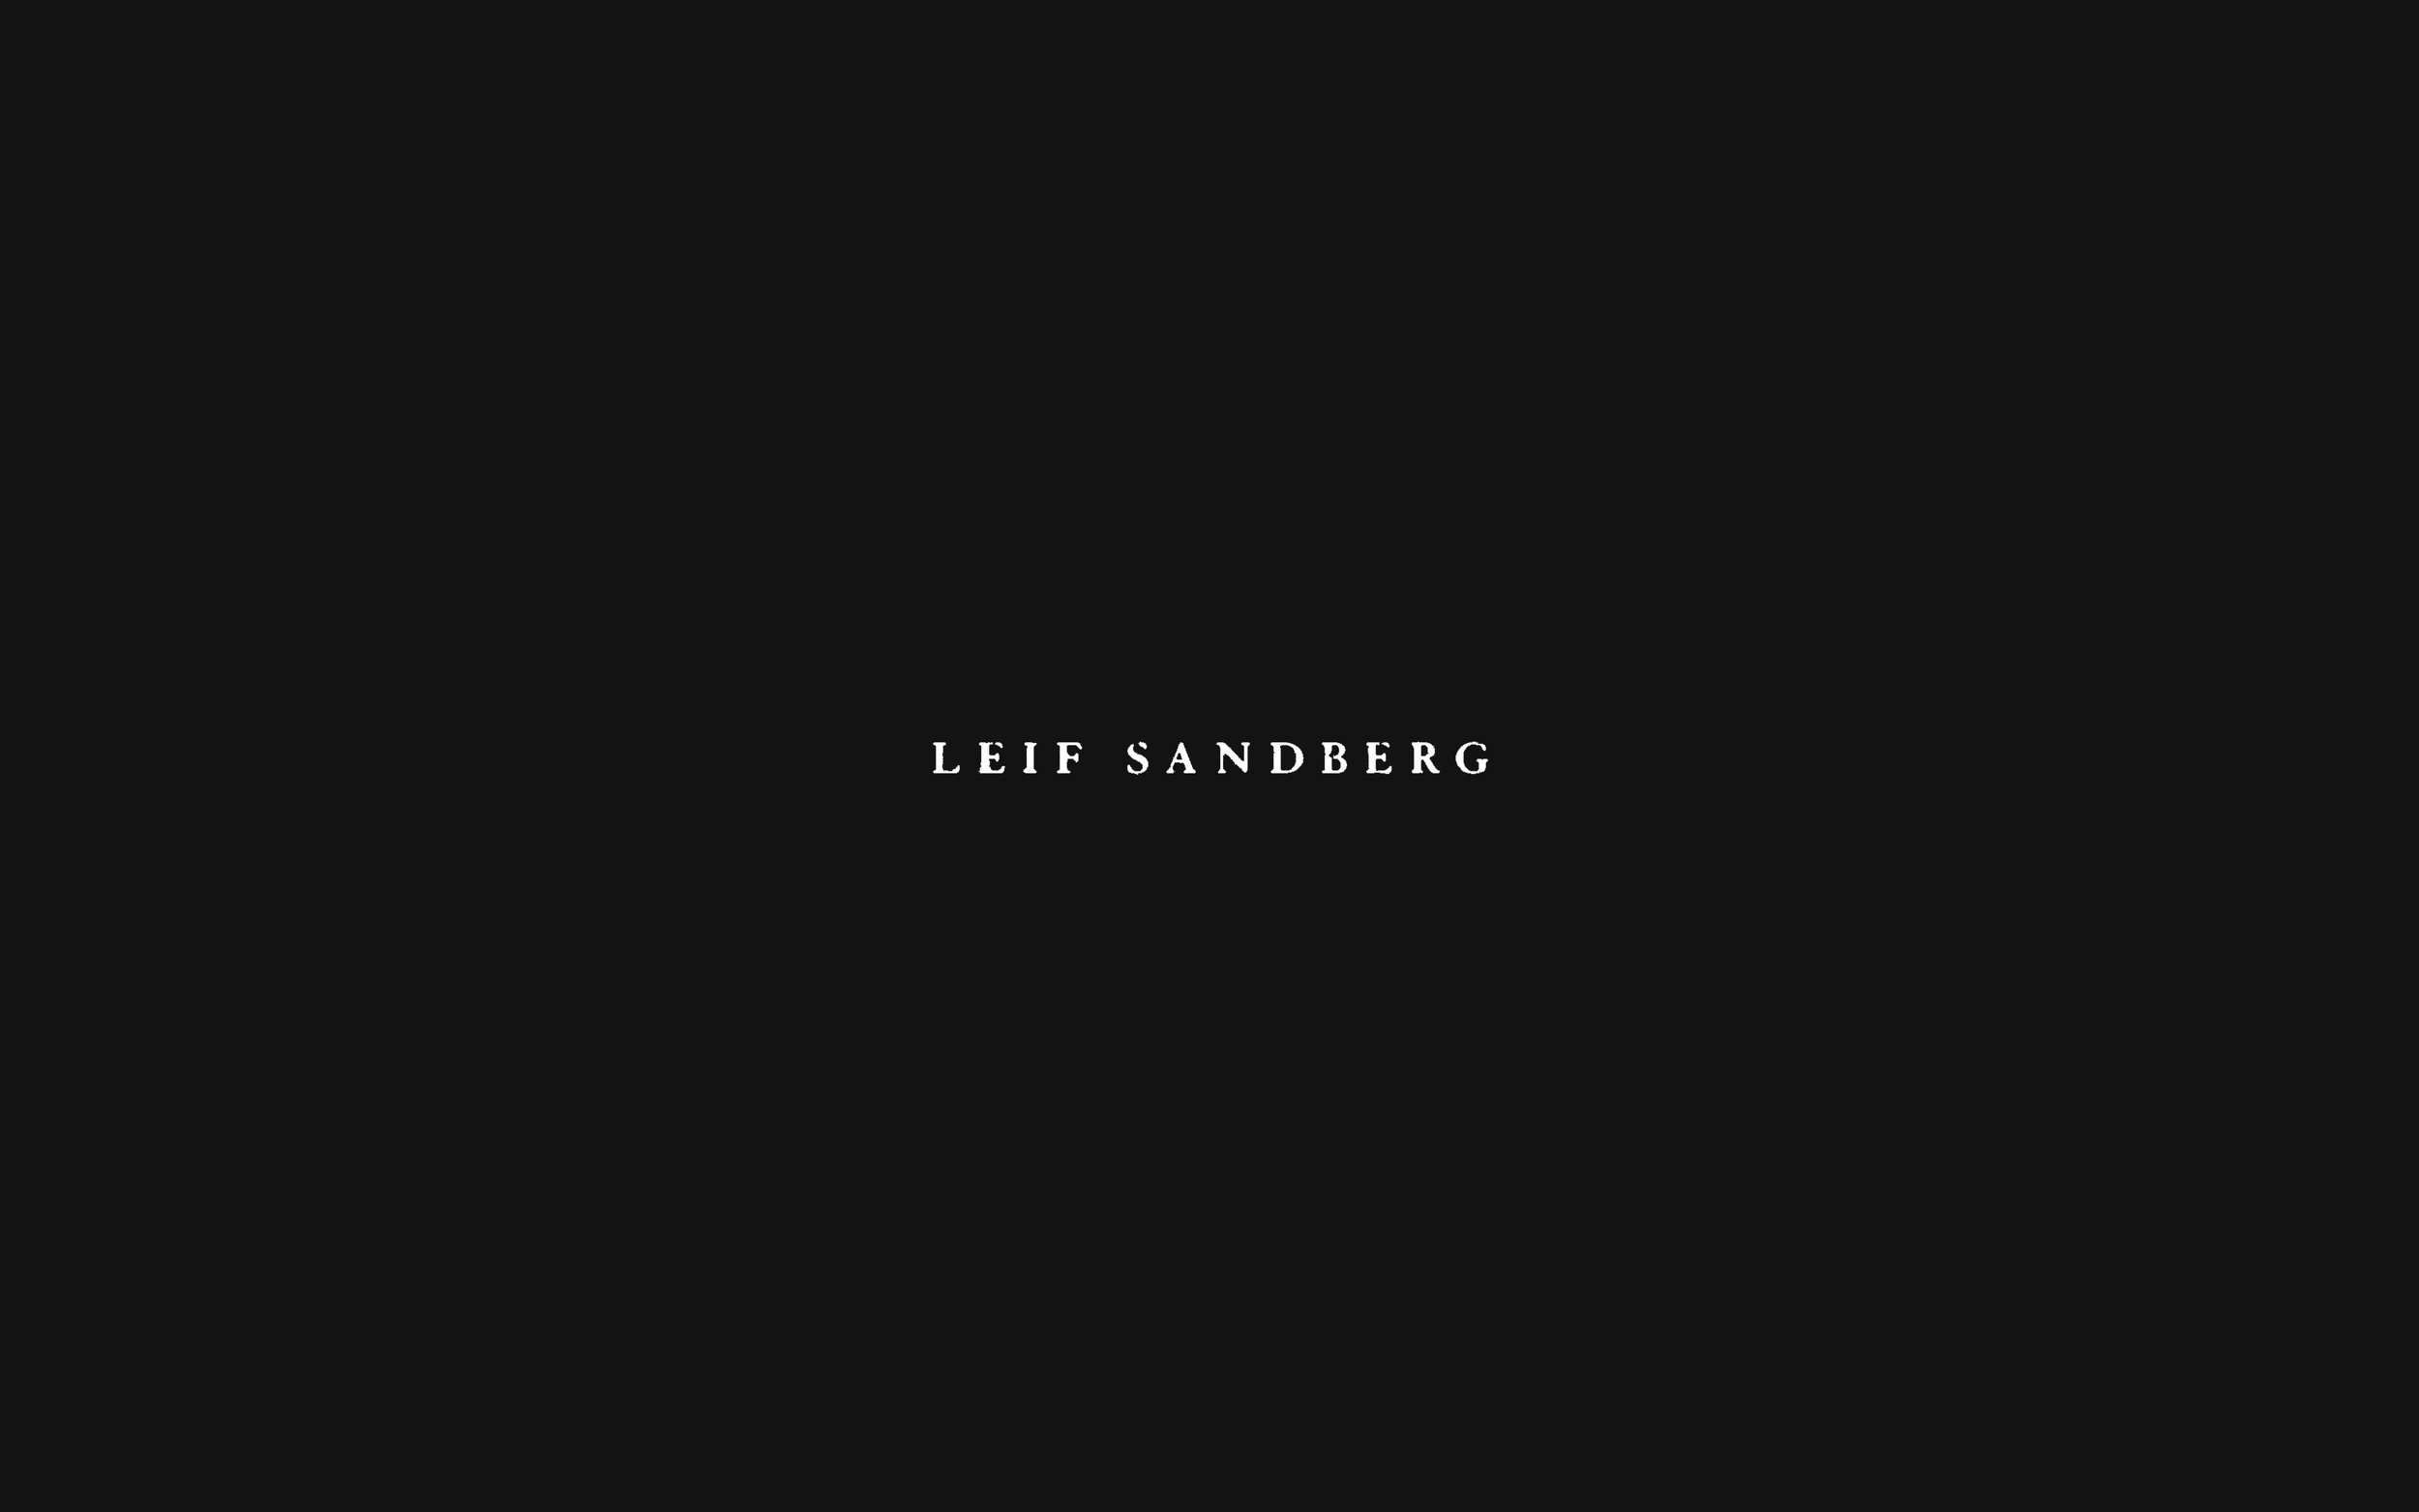 6D__Leif_Sandberg_00.jpg